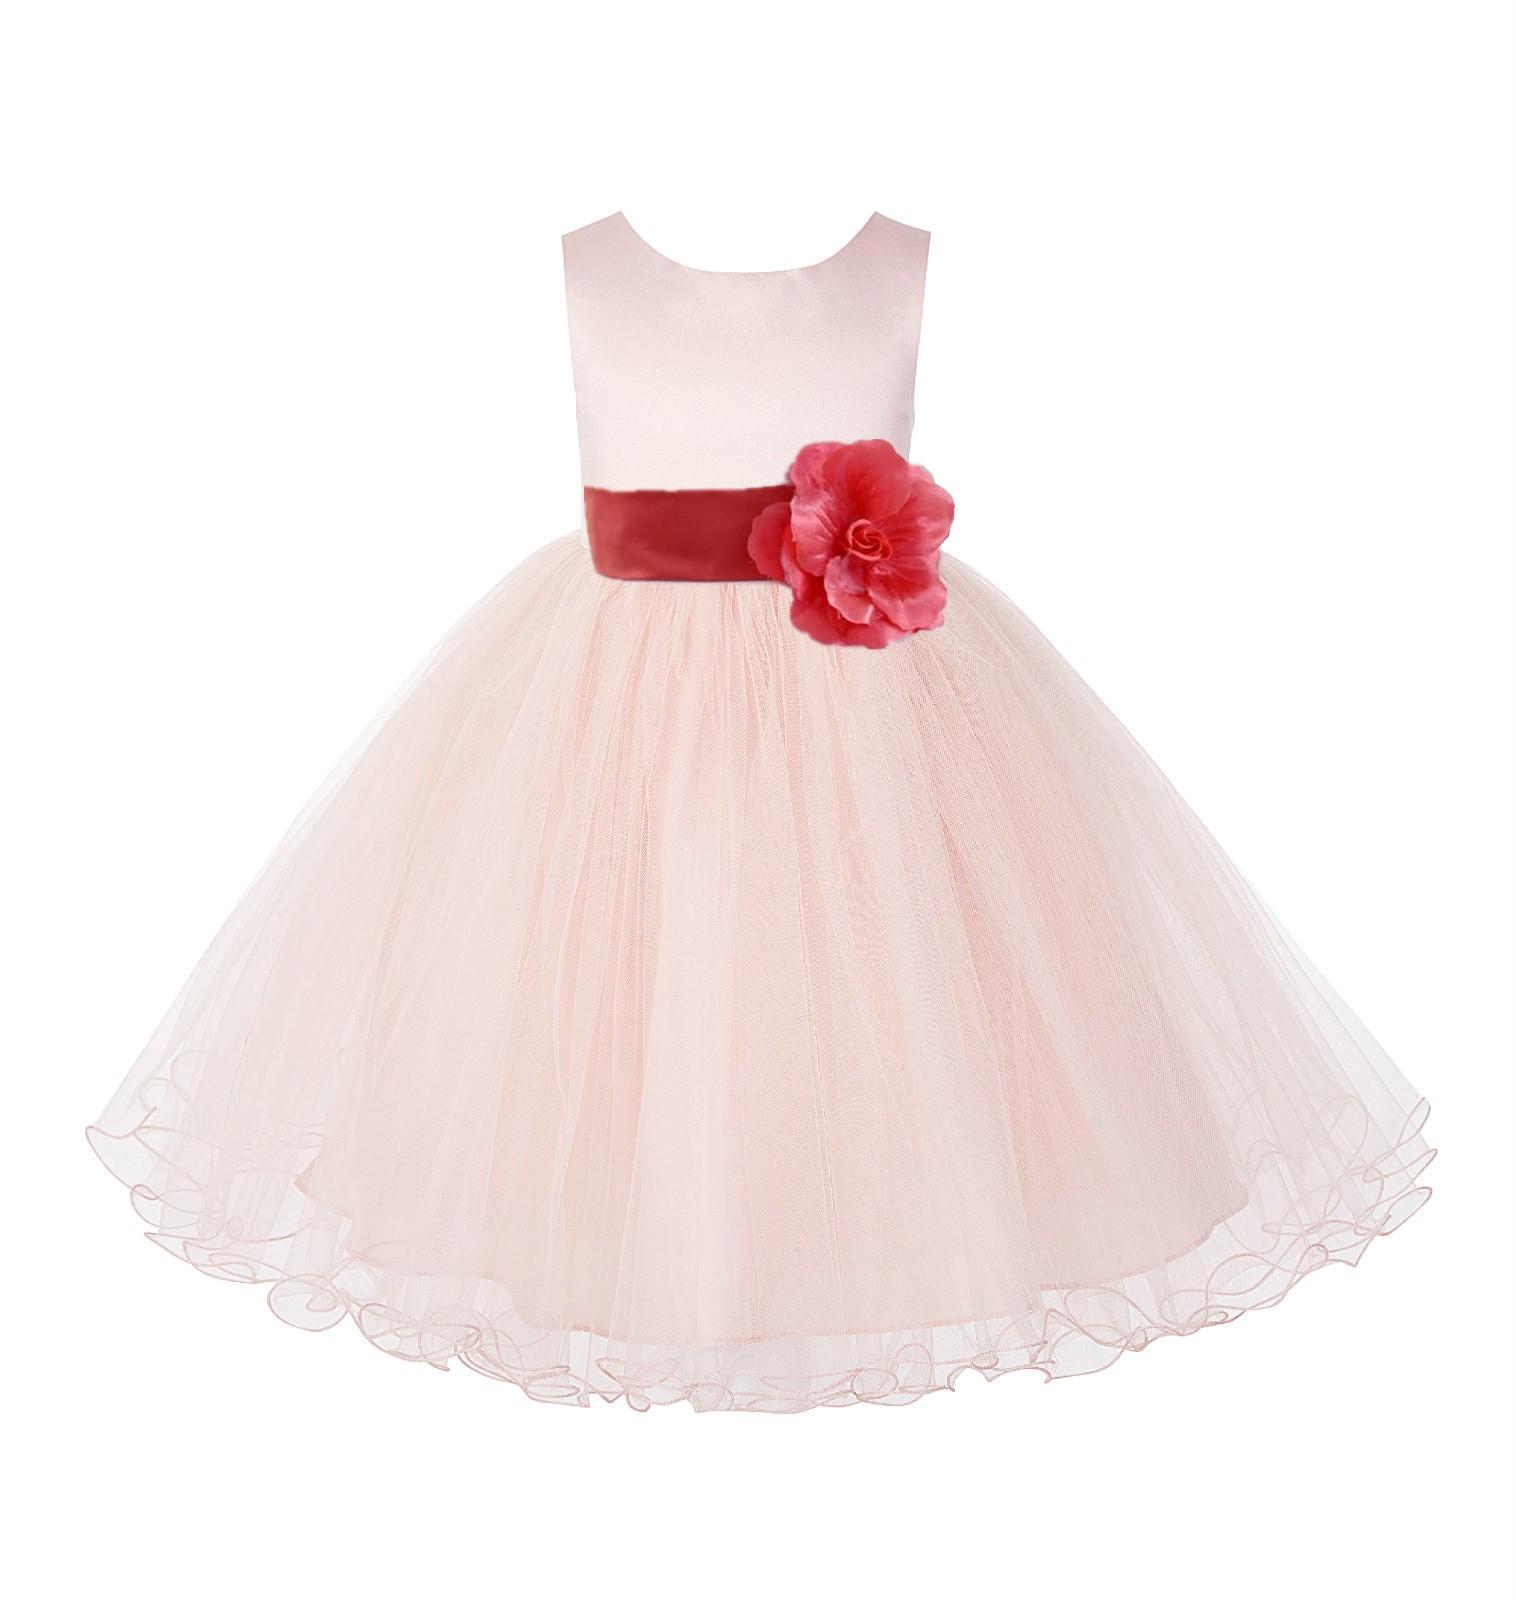 Blush PInk / Guava Tulle Rattail Edge Flower Girl Dress Wedding Bridesmaid 829T